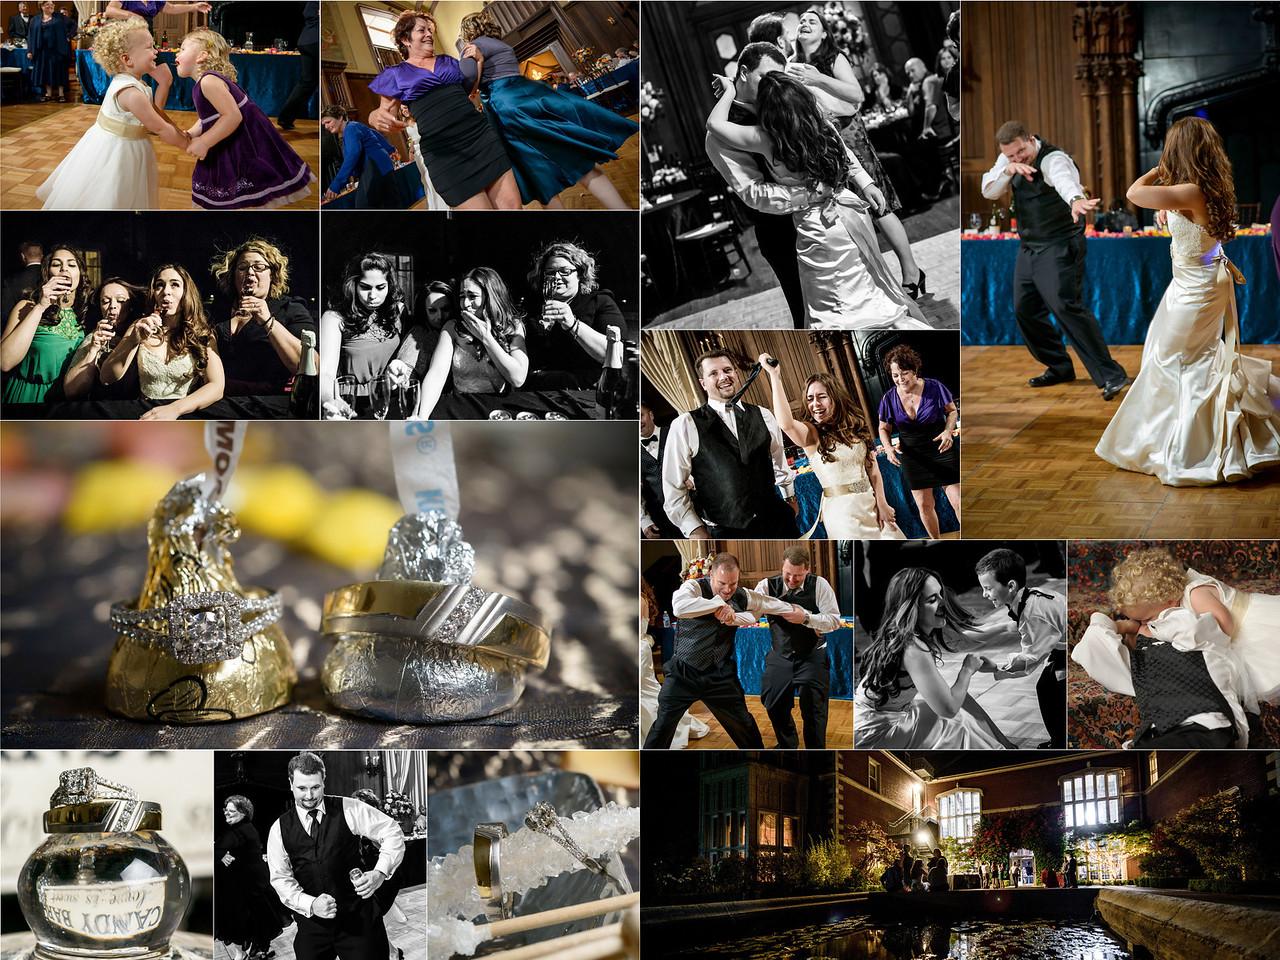 Danielle_and_Tony_Wedding_Photography_4x6_Photo_Board_07